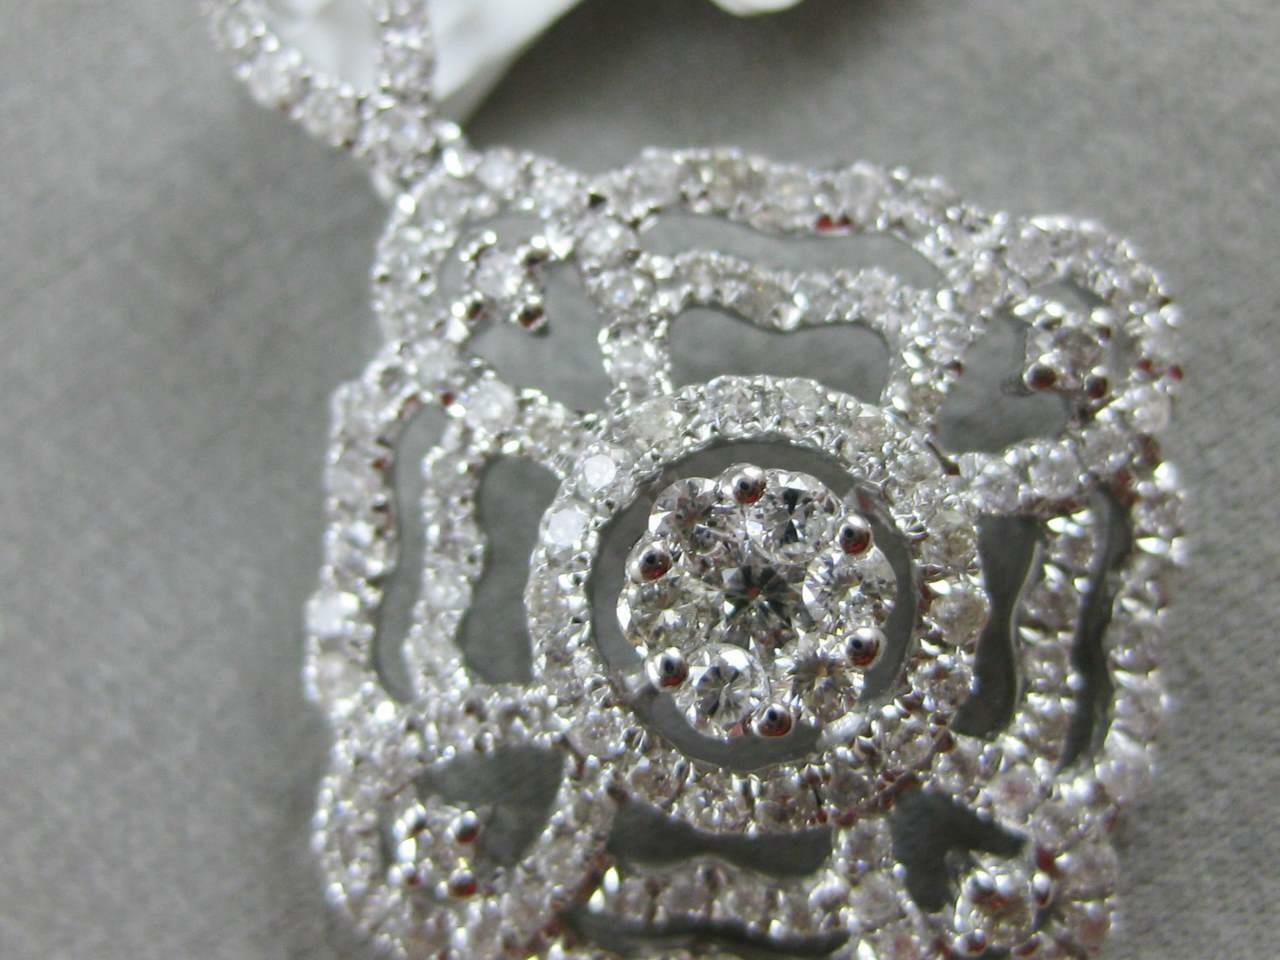 MODERN PAVE DIAMOND 18K WHITE gold HANGING SQUARE FLOWER CLUSTER PENDANT MBP7124